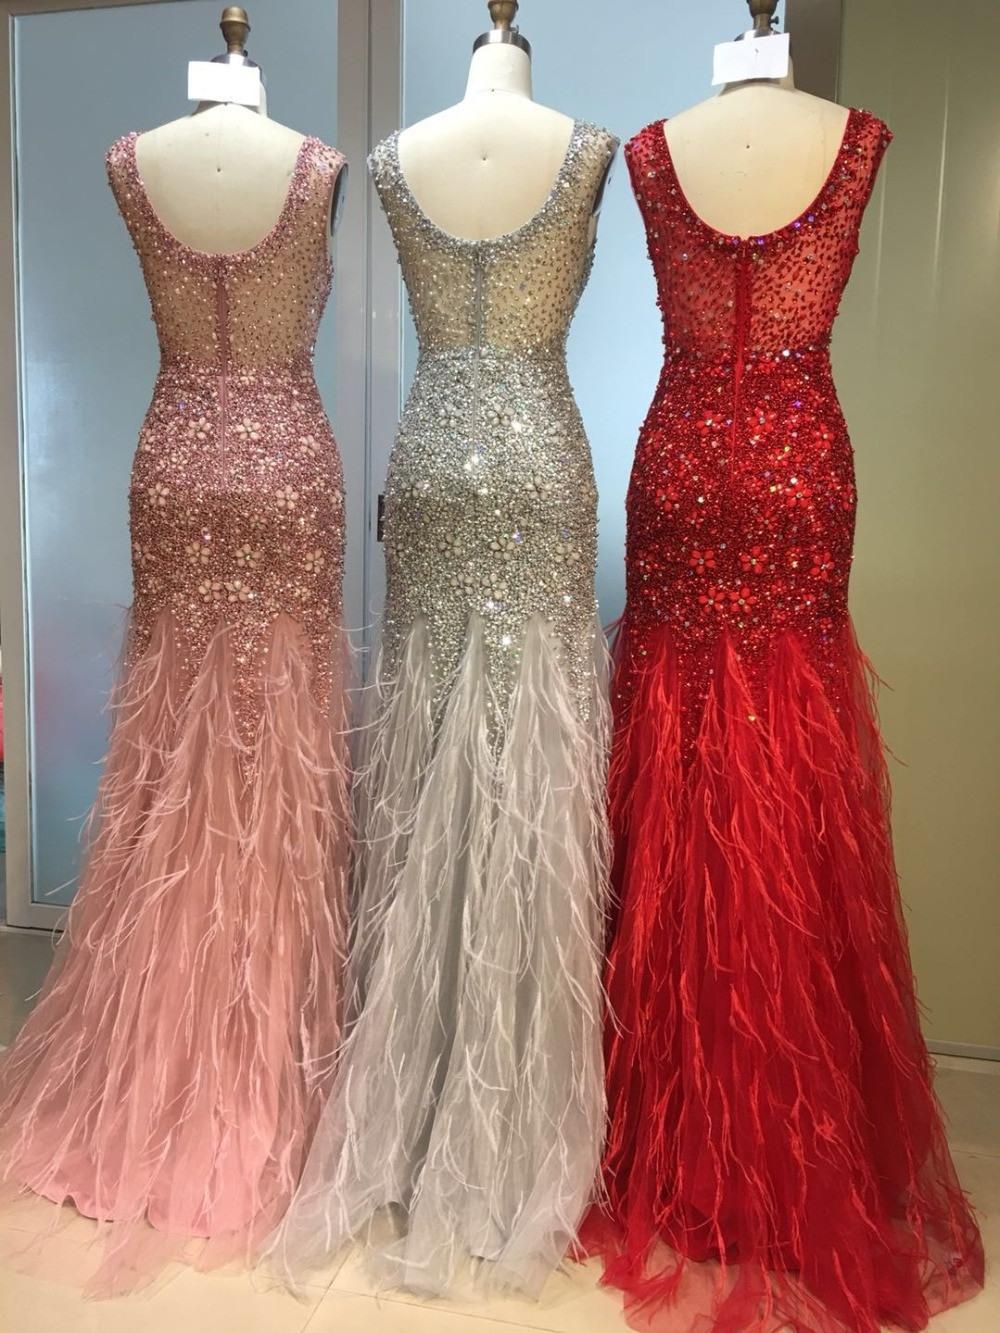 13 Perfekt Abendkleider Quedlinburg Bester Preis10 Kreativ Abendkleider Quedlinburg Spezialgebiet